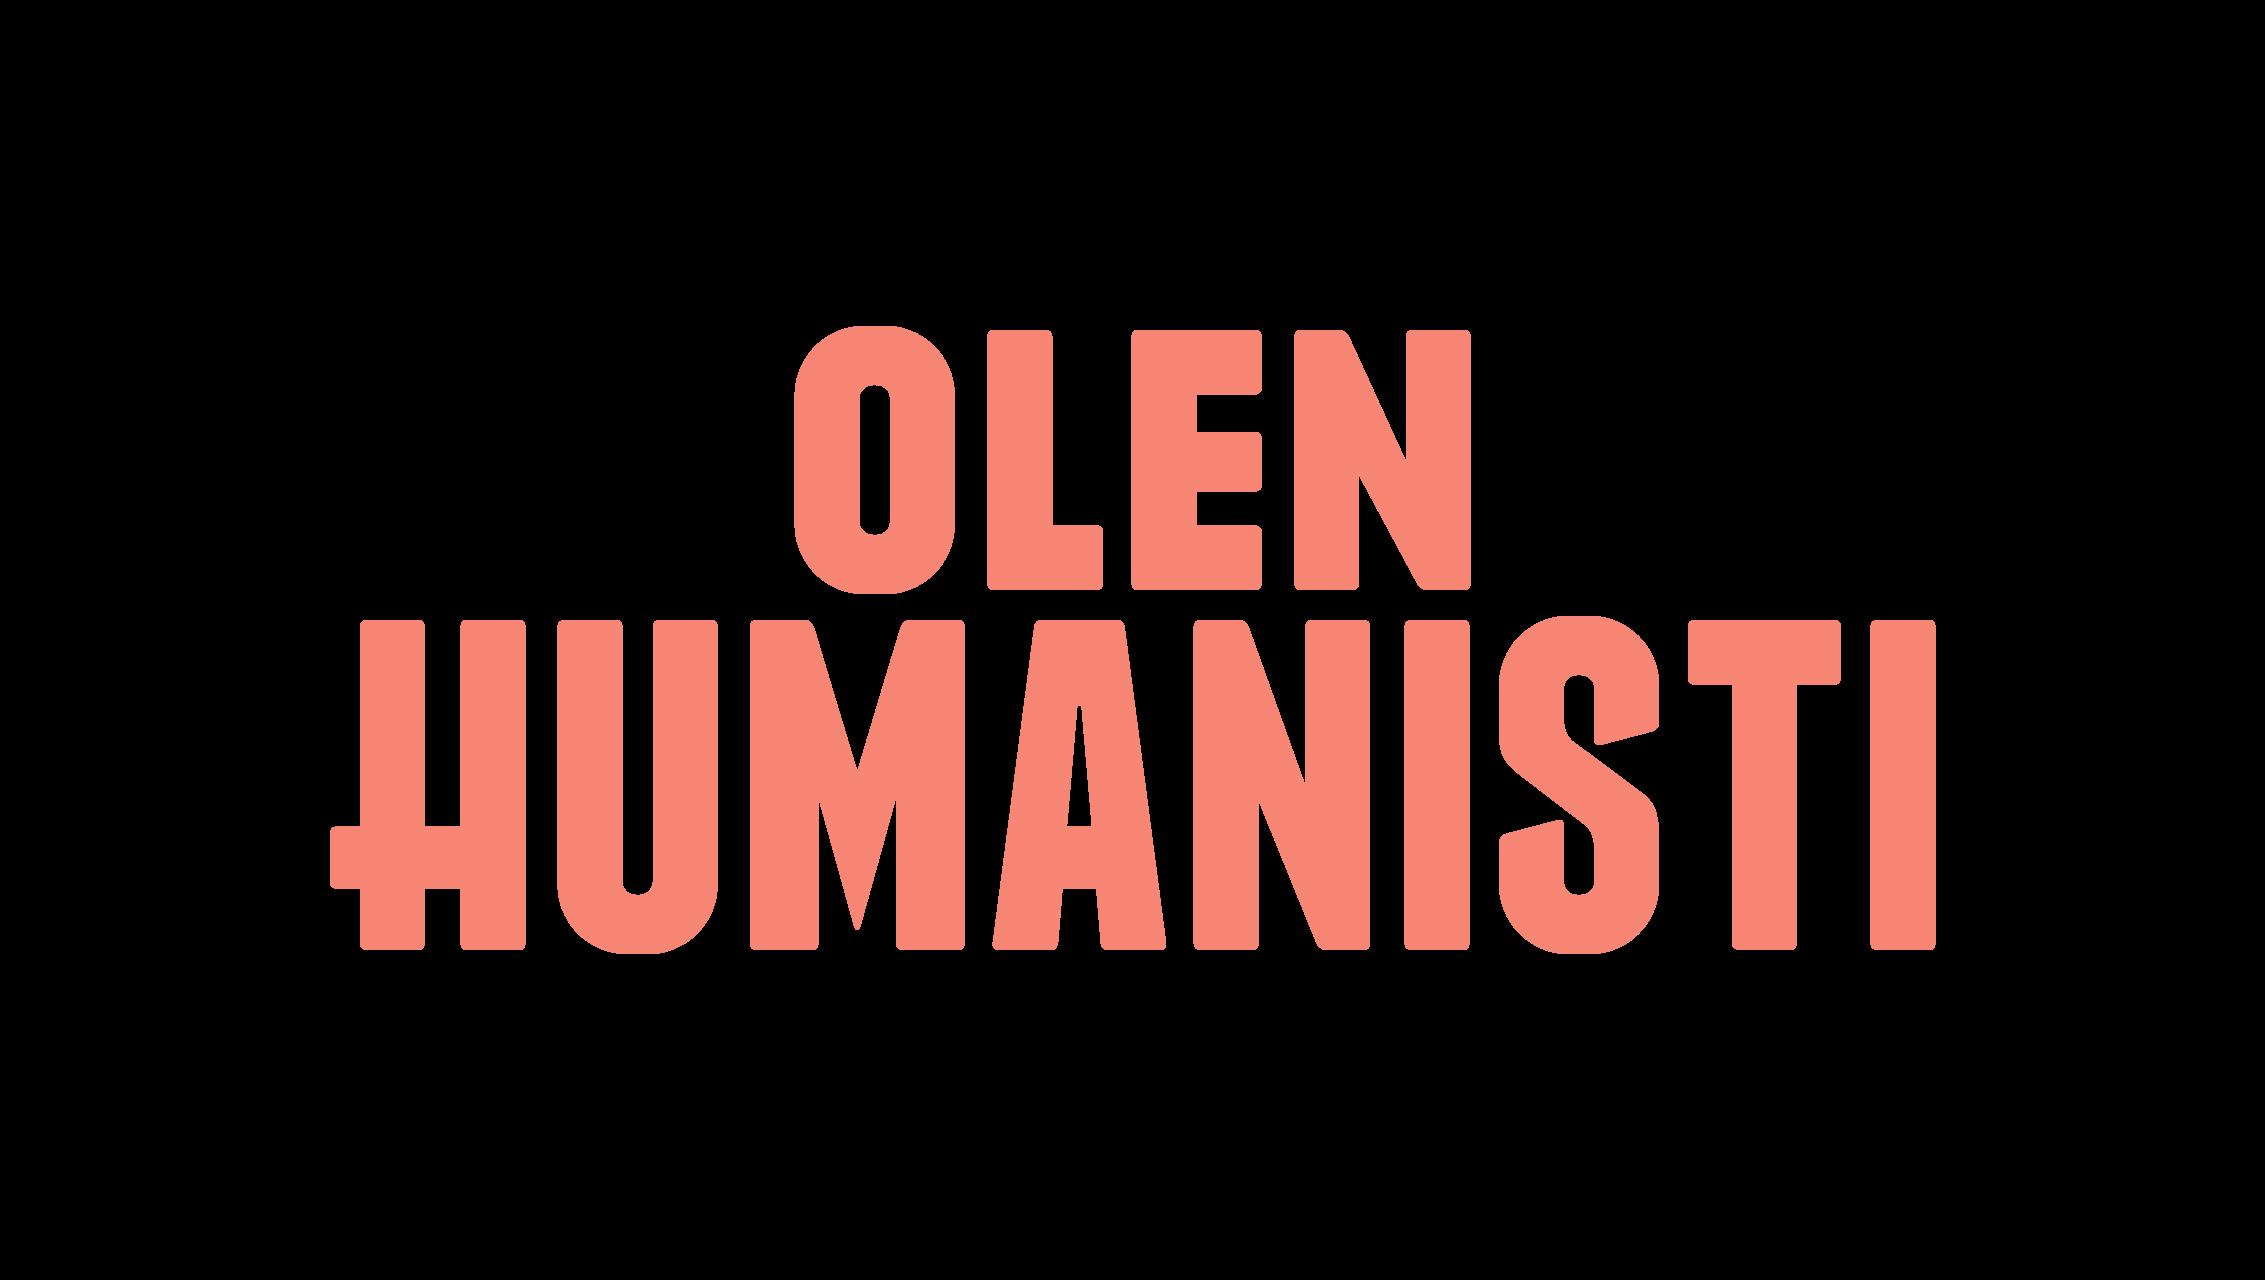 Olen humanisti logo